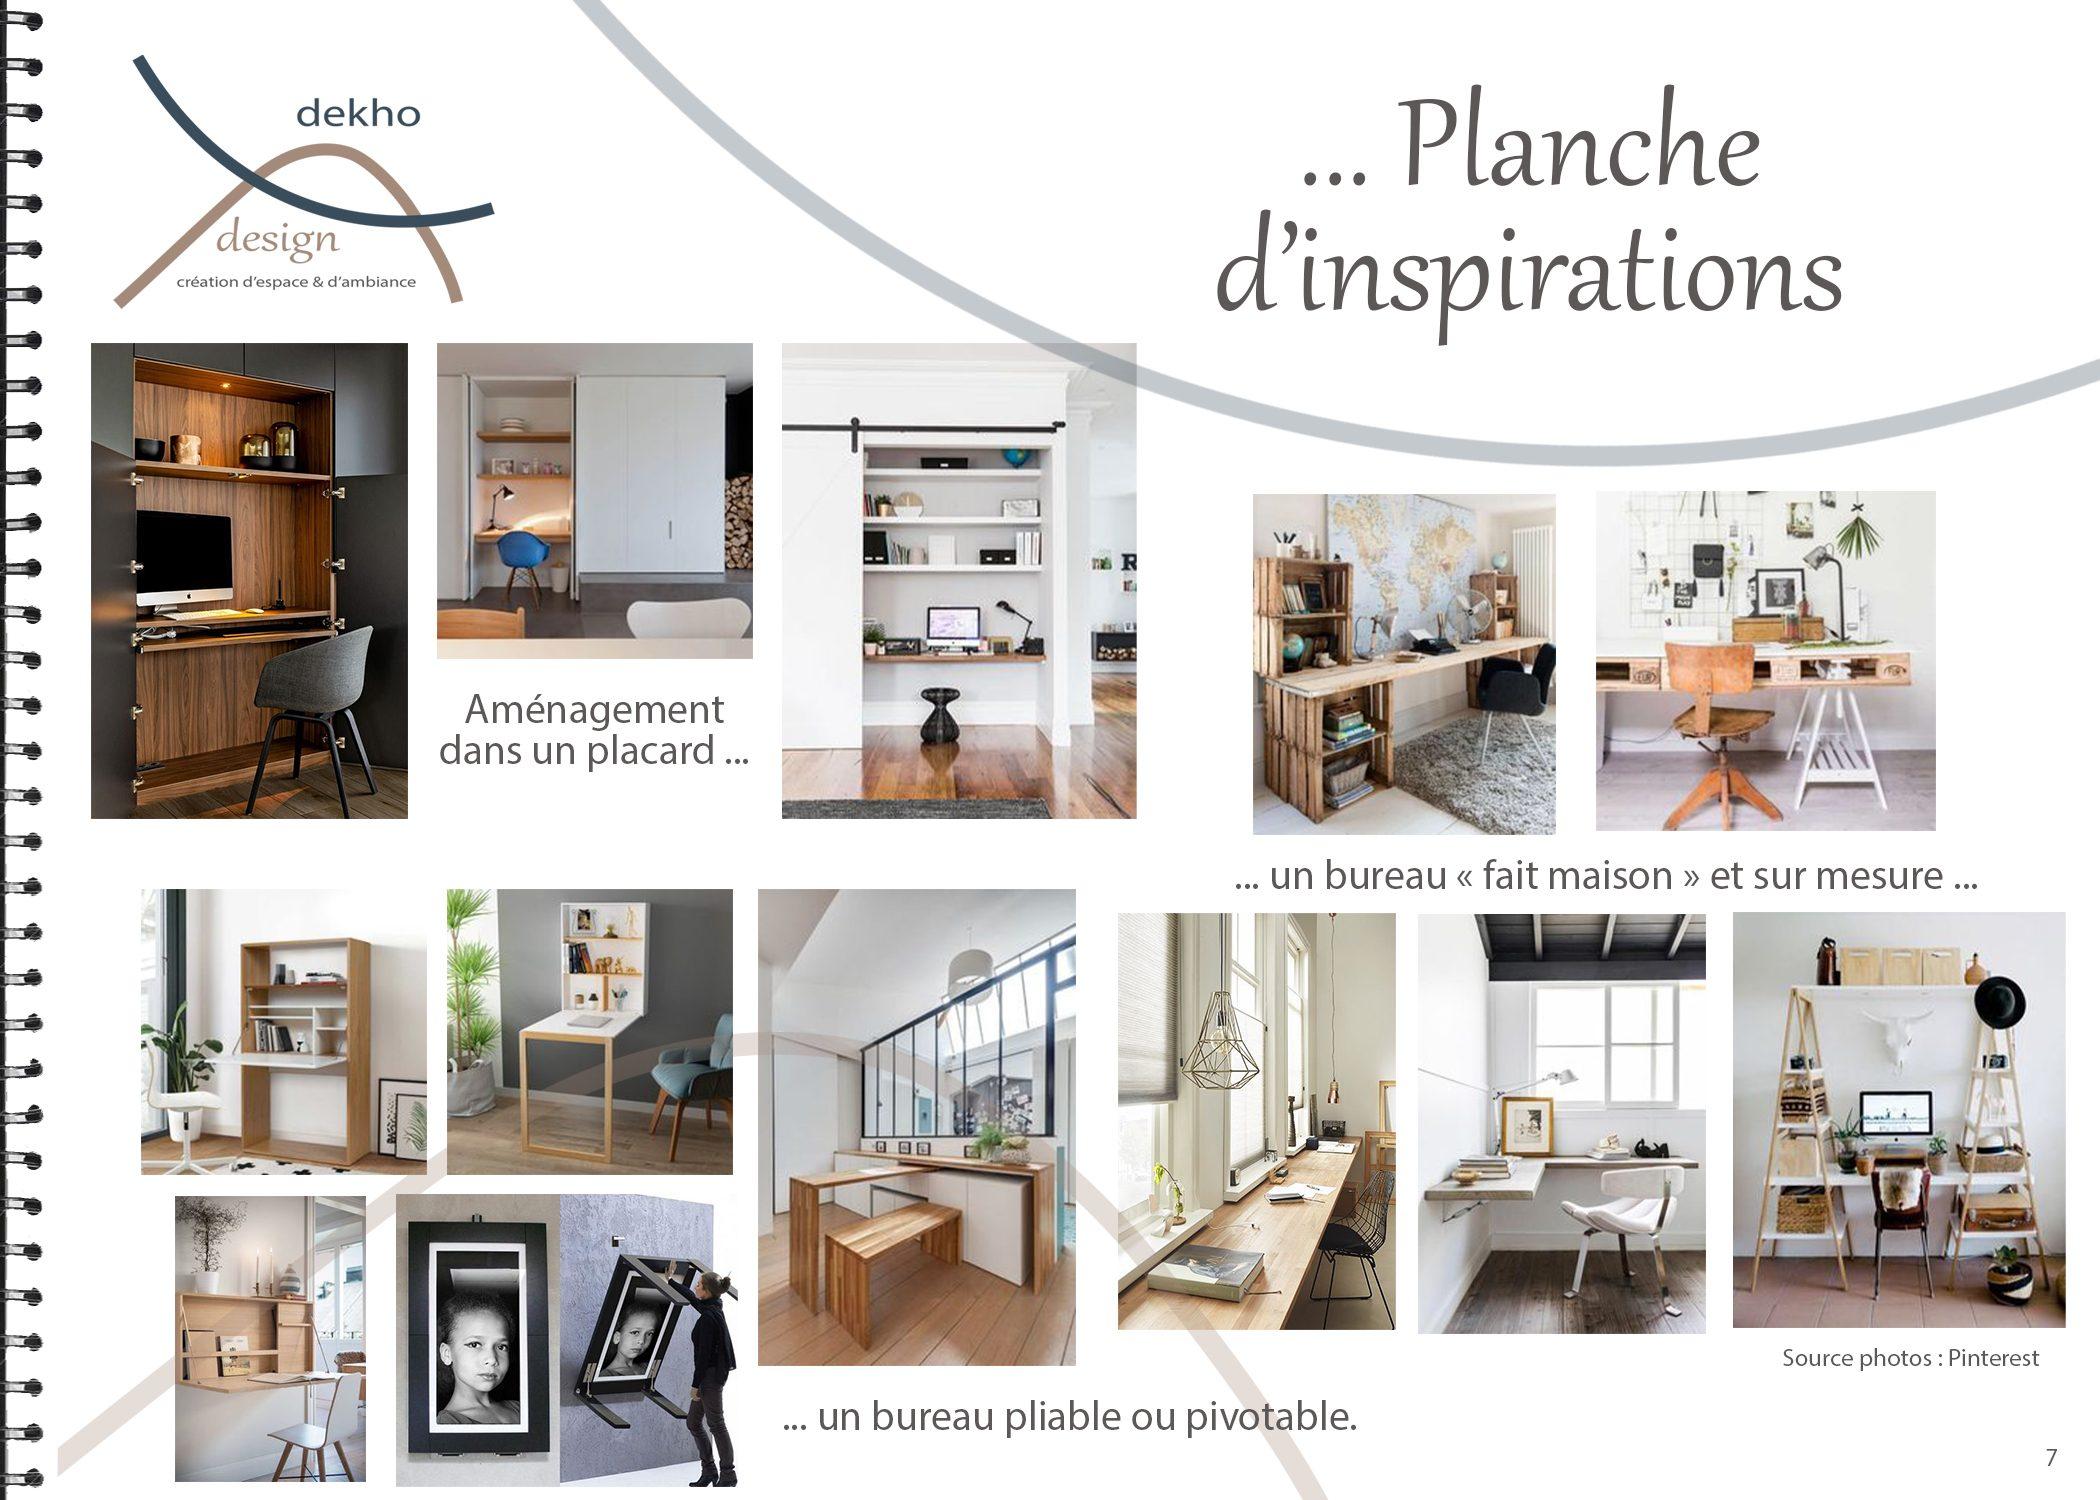 carnet d'intérieur-coin bureau-inspirations-conseils 2-dekho design